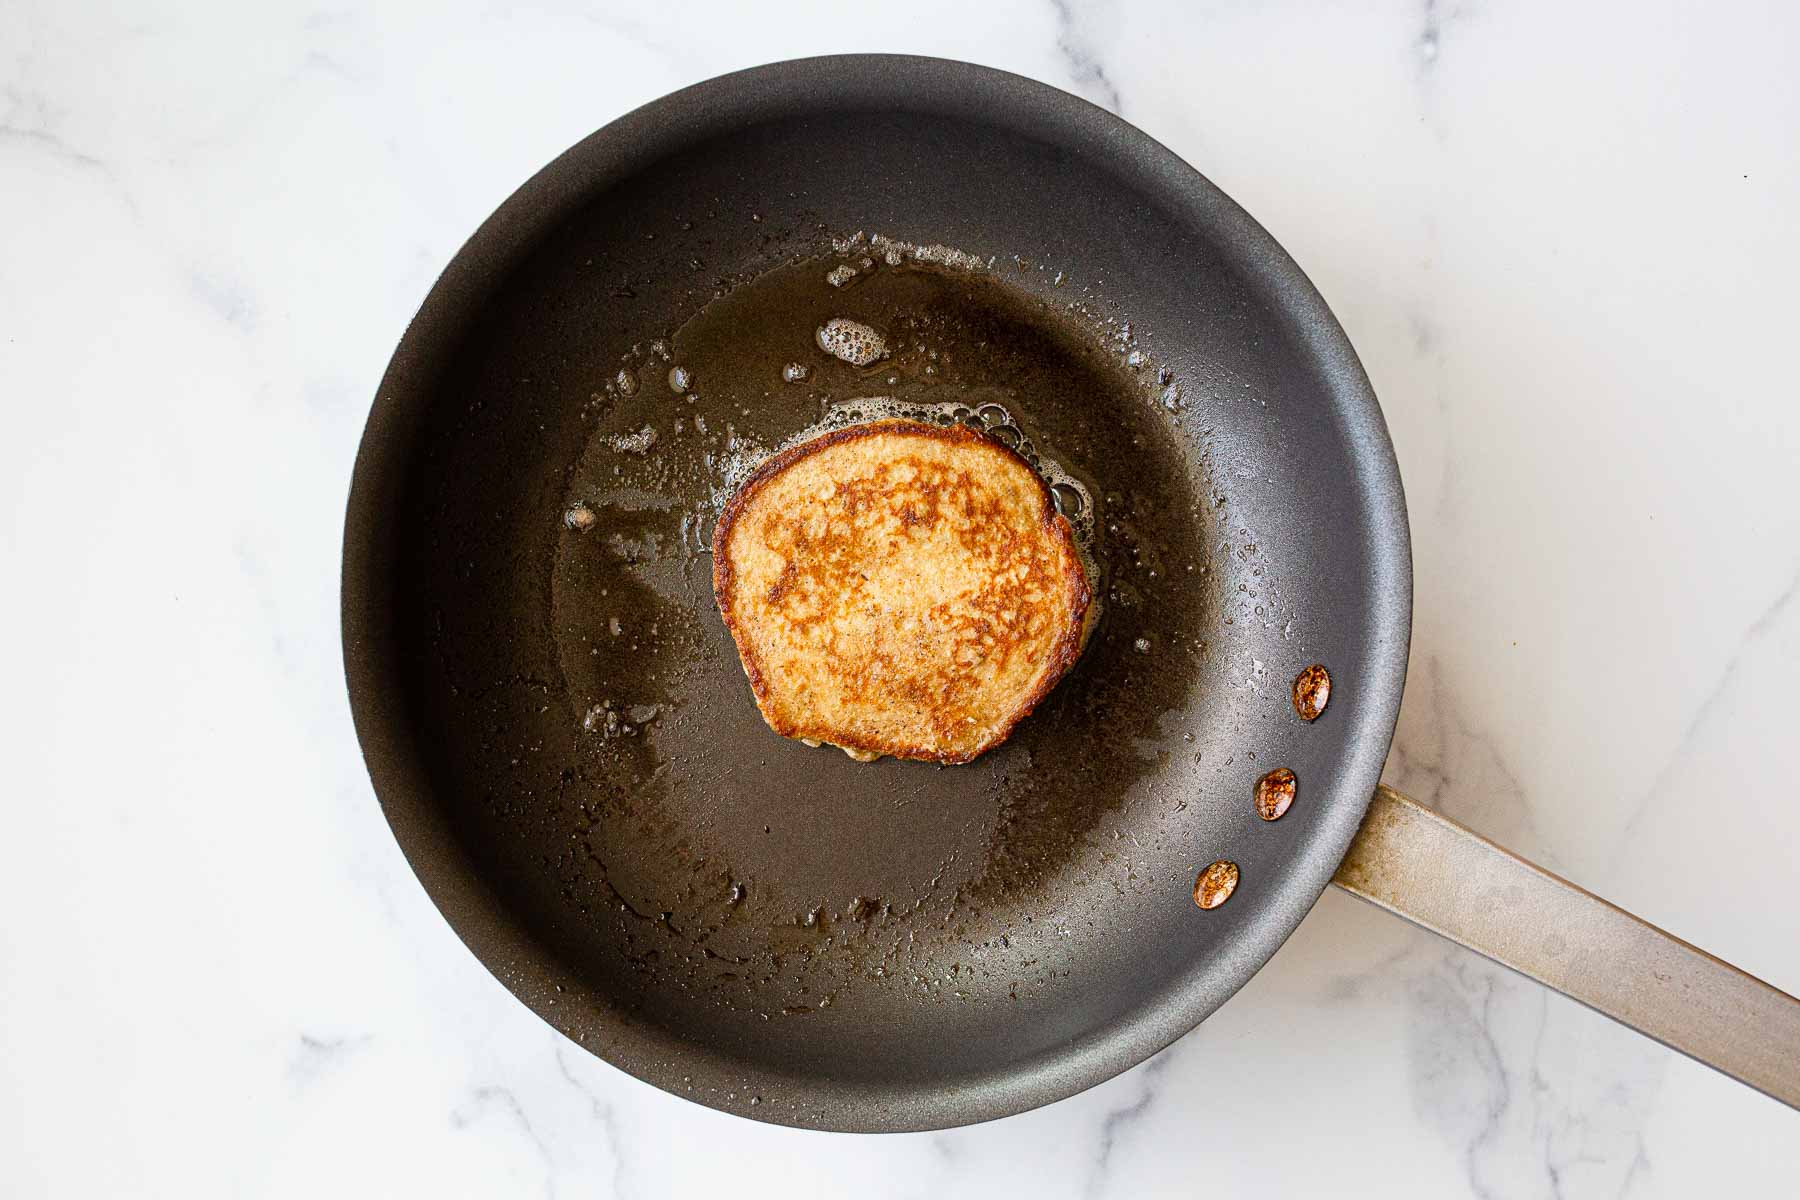 Cooked pancake in nonstick skillet.